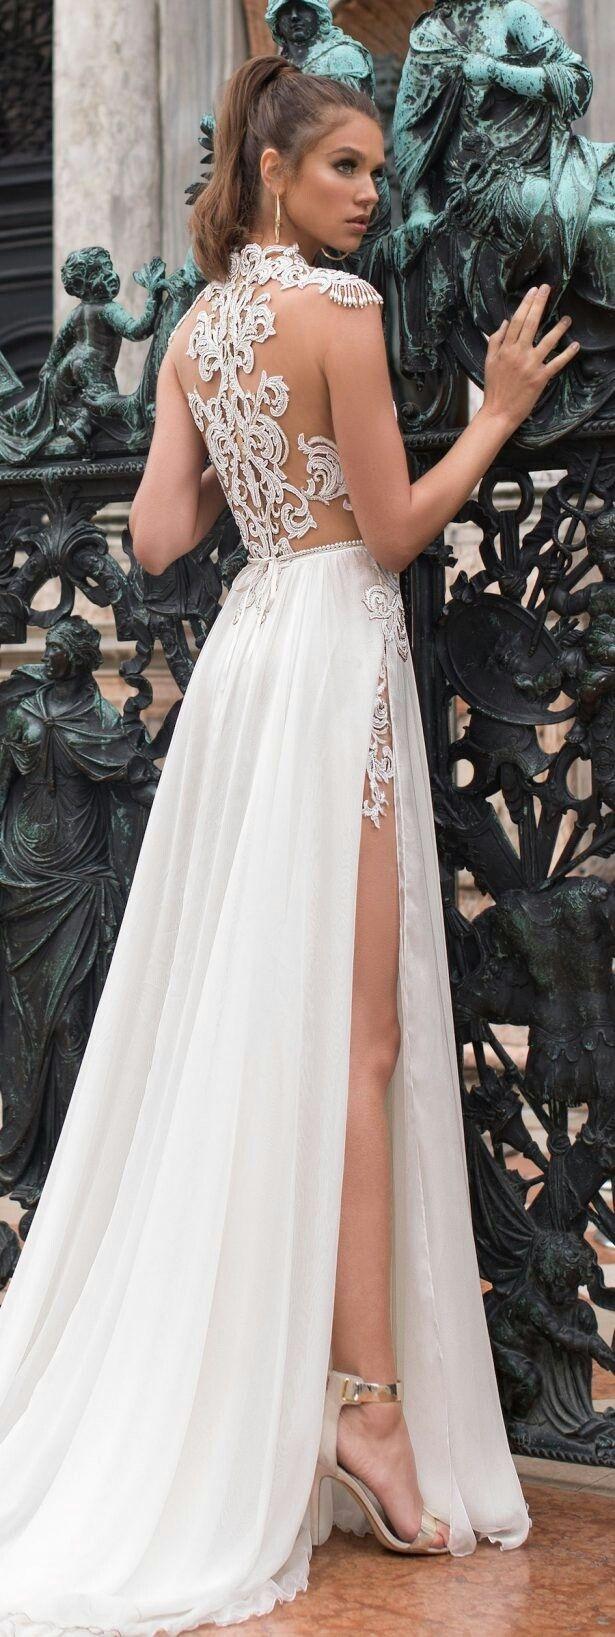 Lace wedding dress cheap december 2018 Pin by Sab on Wedding dress in   Pinterest  Wedding dress